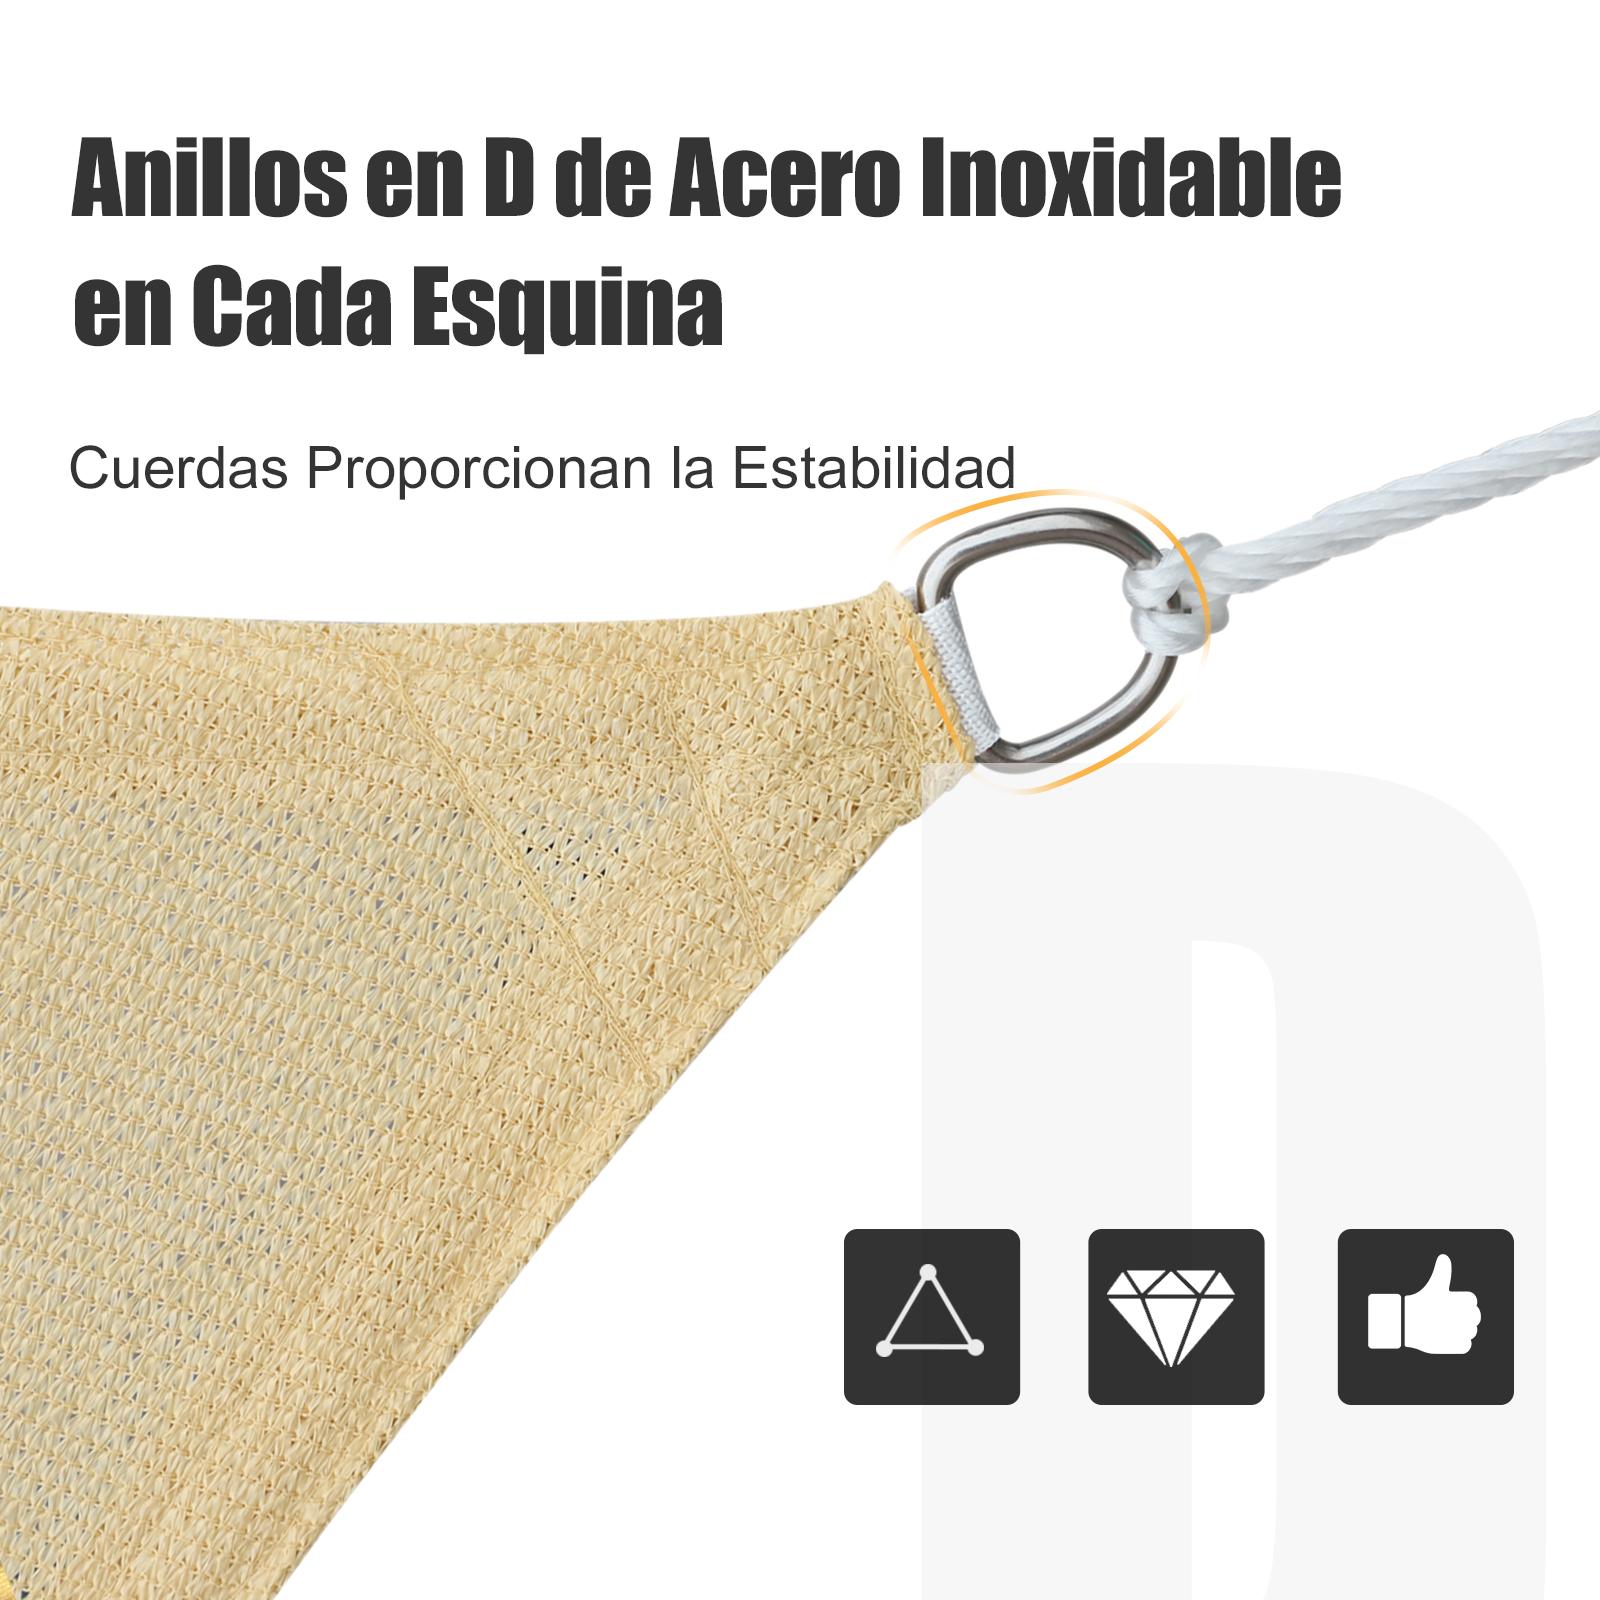 Toldo-Vela-Sombrilla-Parasol-Triangulo-Tejido-de-Poliester-185-g-m-Jardin-Playa miniatura 6